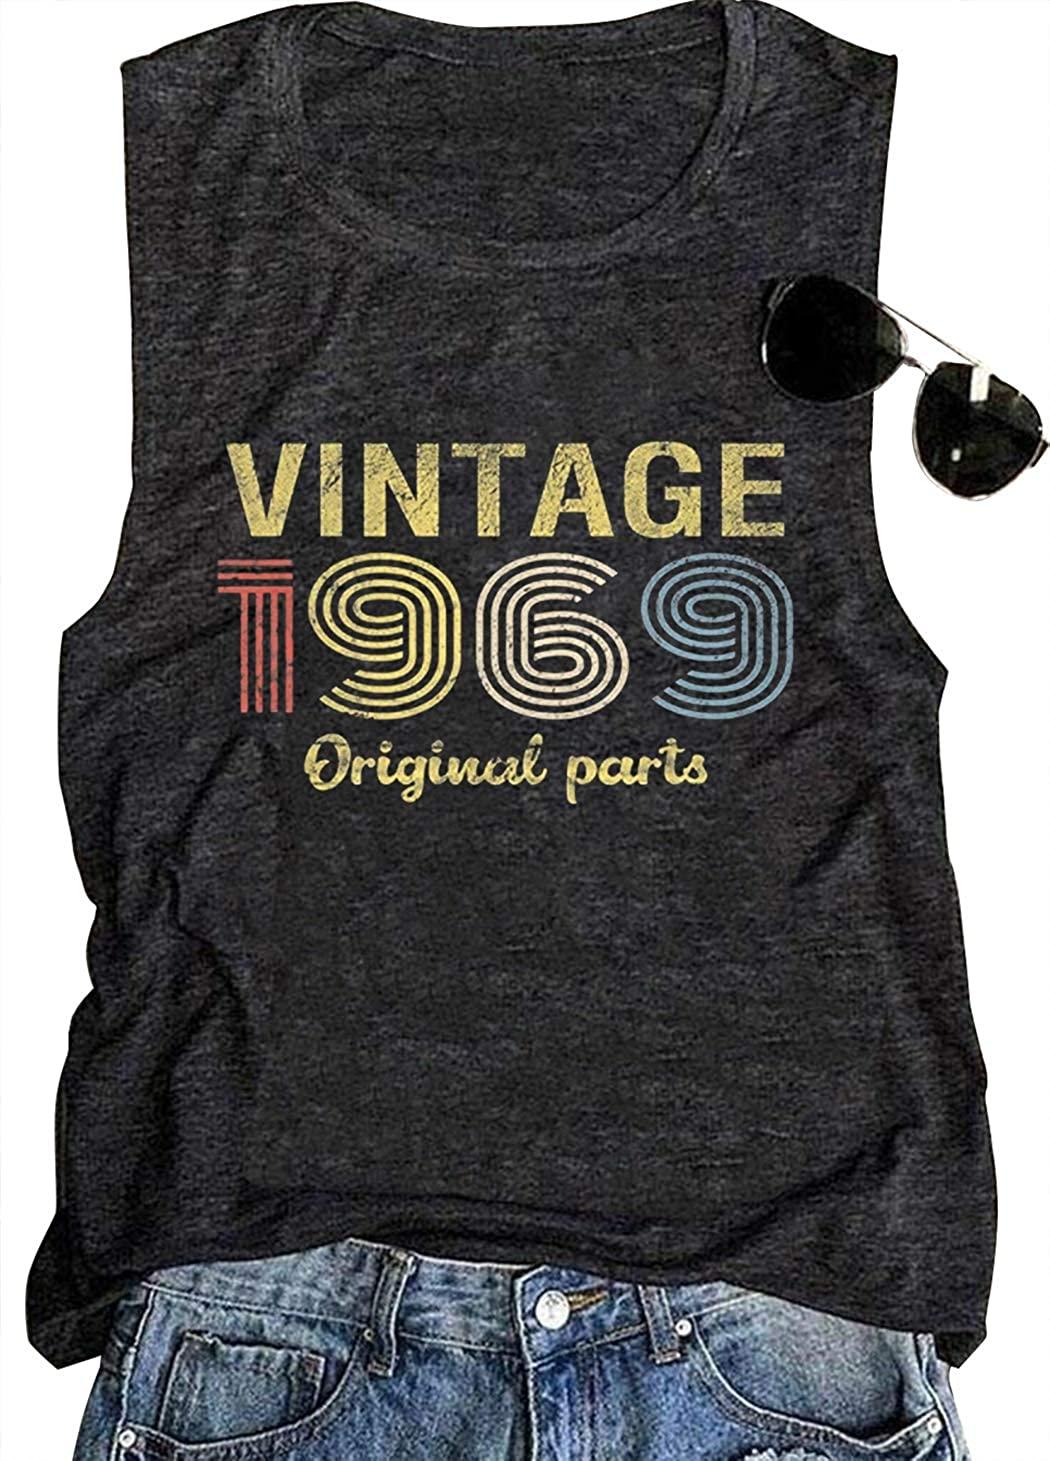 50th Birthday Gift Tank Tops for Women Vintage 1969 Original Parts Rock Legend Shirt Summer Casual Music T Shirt